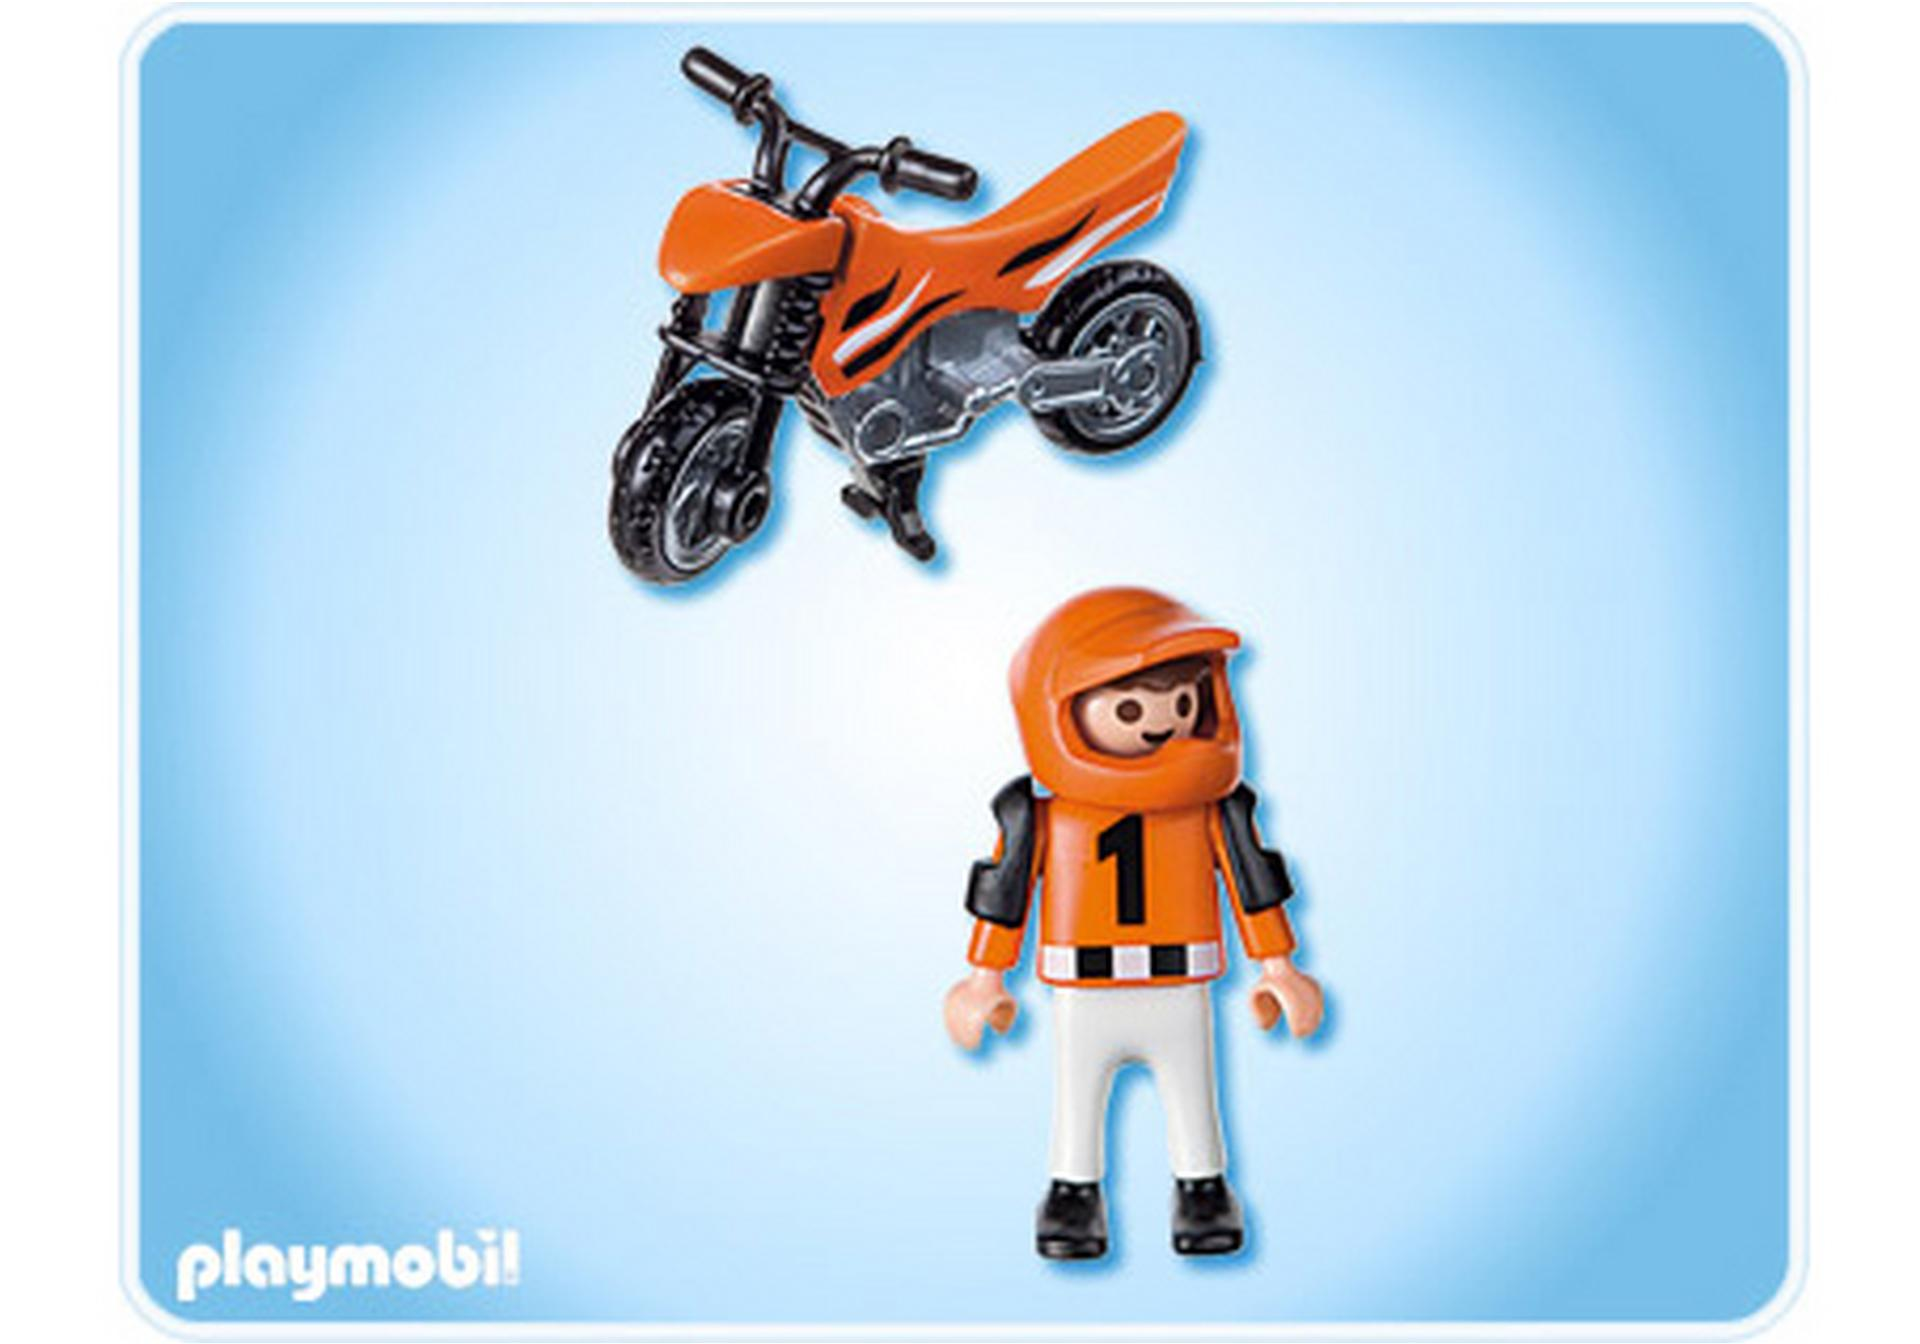 Enfant et motocross 4698 a playmobil france - Moto cross playmobil ...